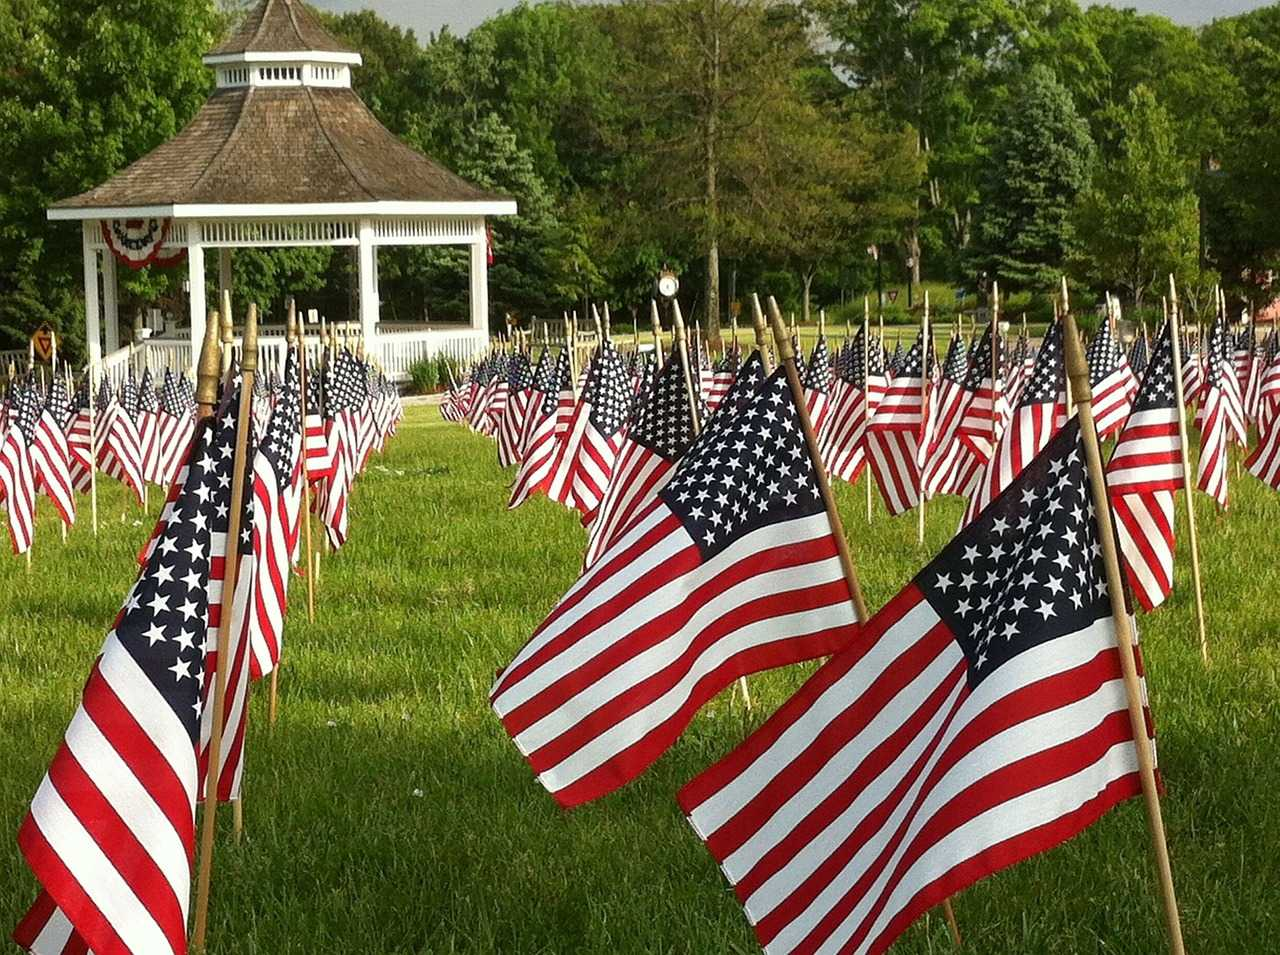 https://pixabay.com/en/flags-american-memorial-day-freedom-292774/